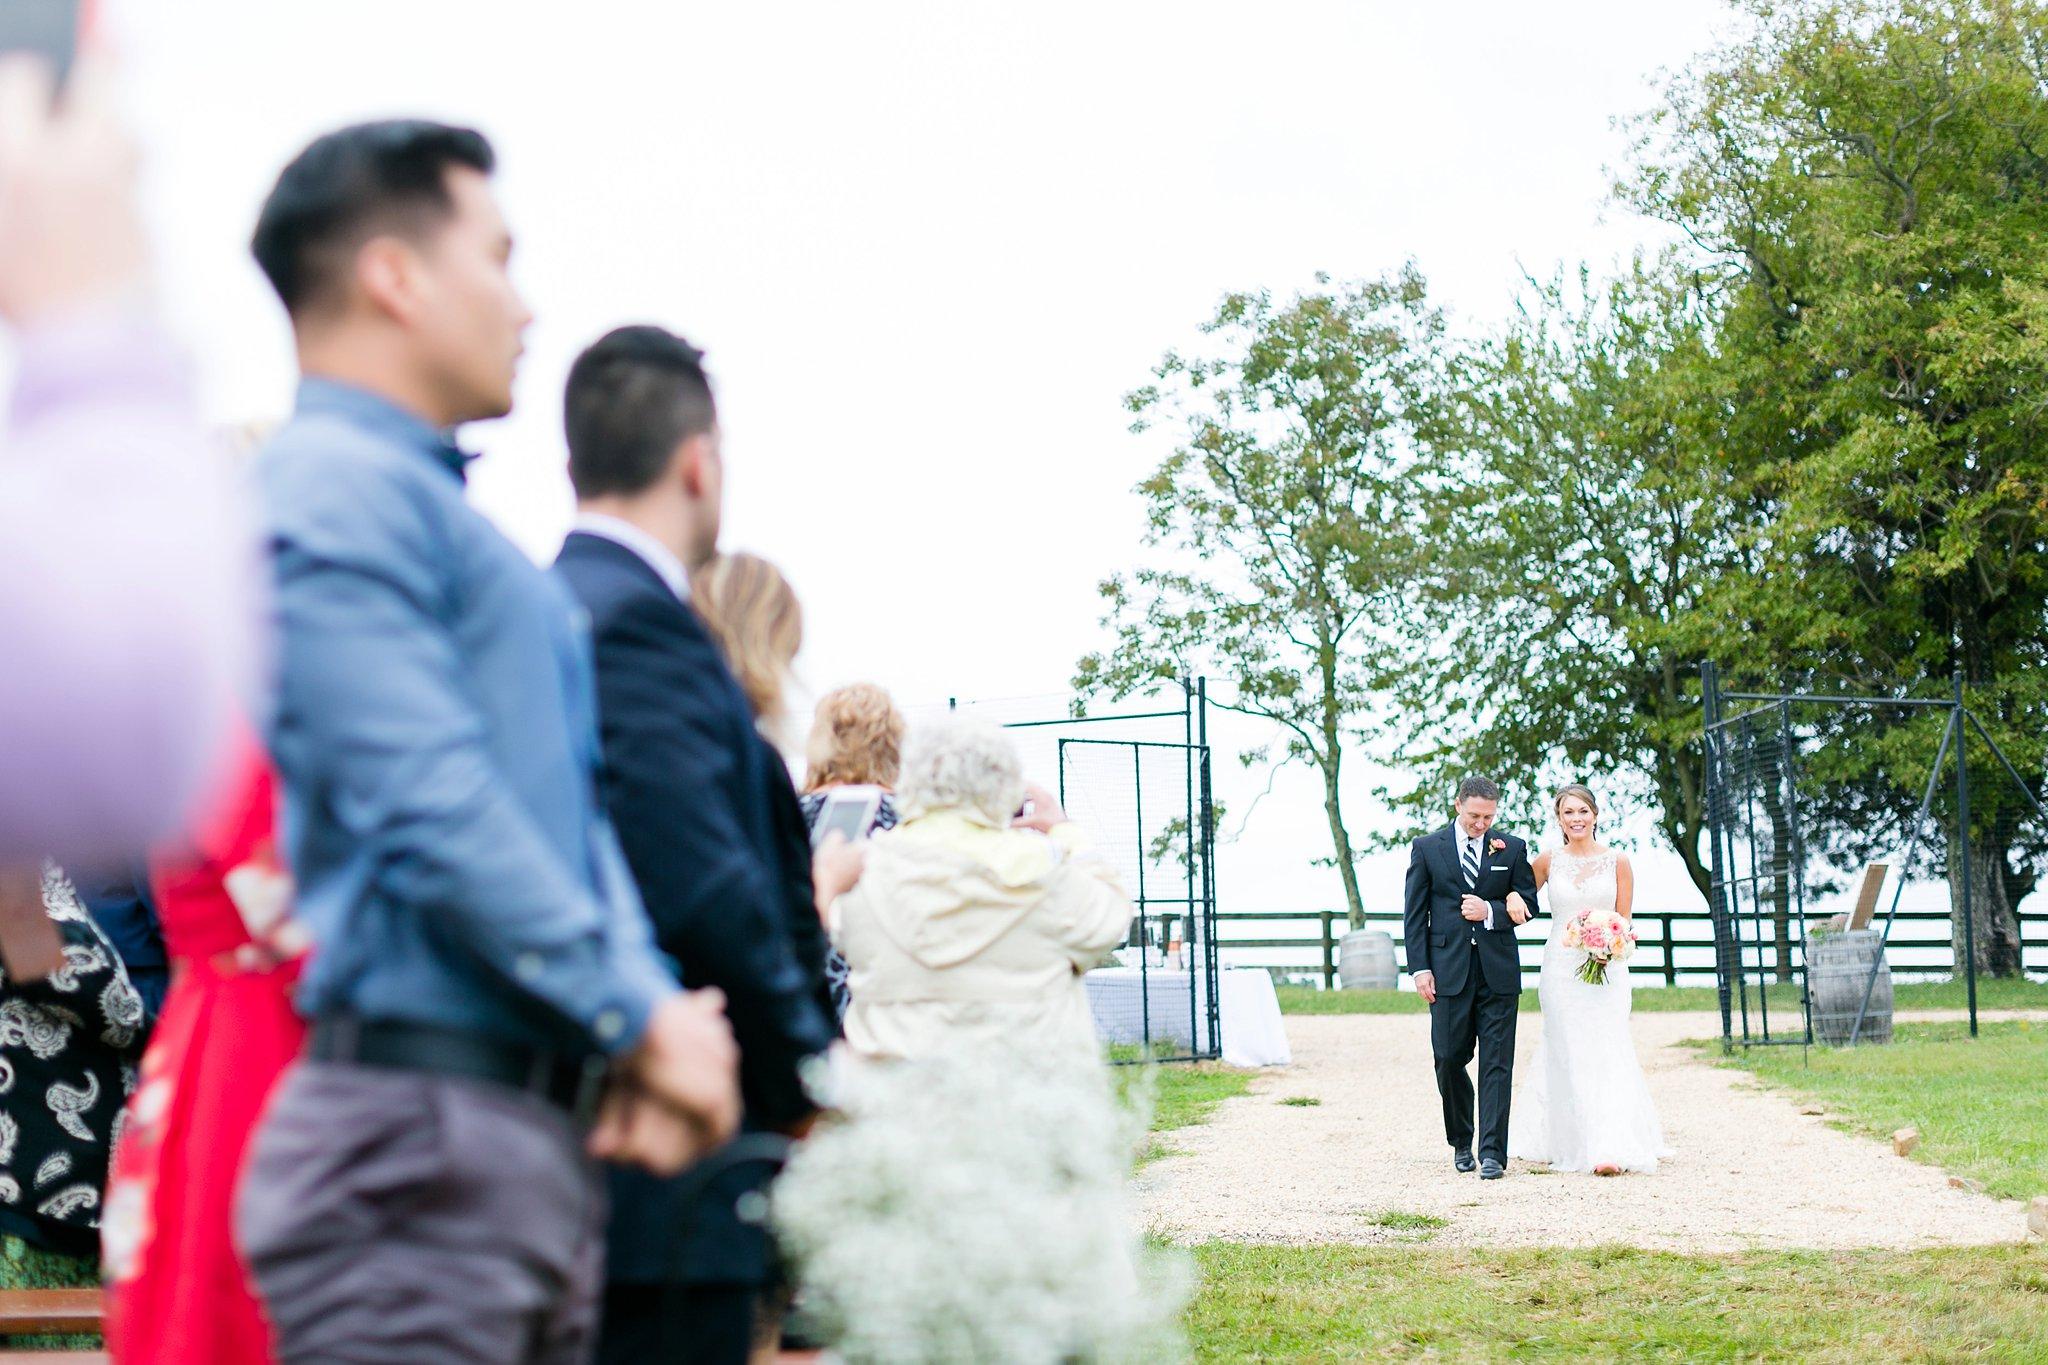 Stone Tower Winery Wedding Photos Virginia Wedding Photographer Megan Kelsey Photography Sam & Angela-148.jpg